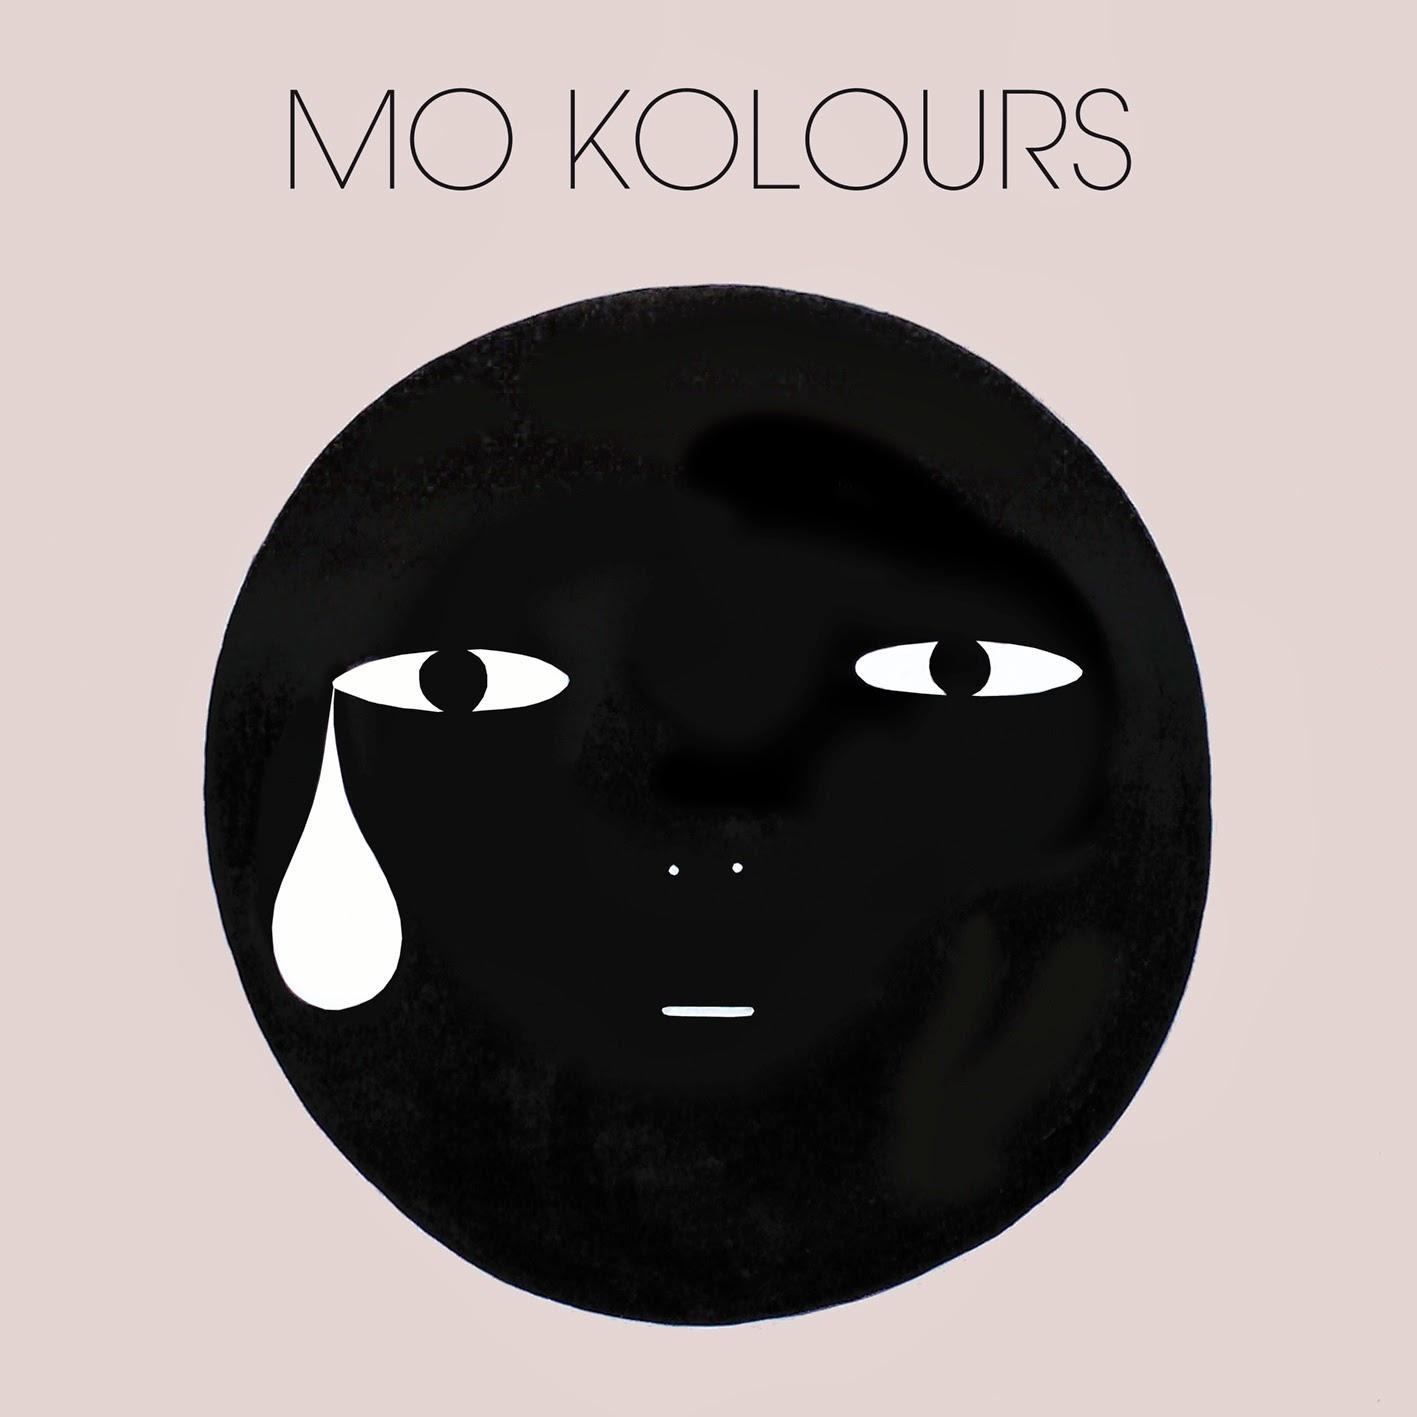 Discosafari - MO KOLOURS - MO KOLOURS - One Handed Music